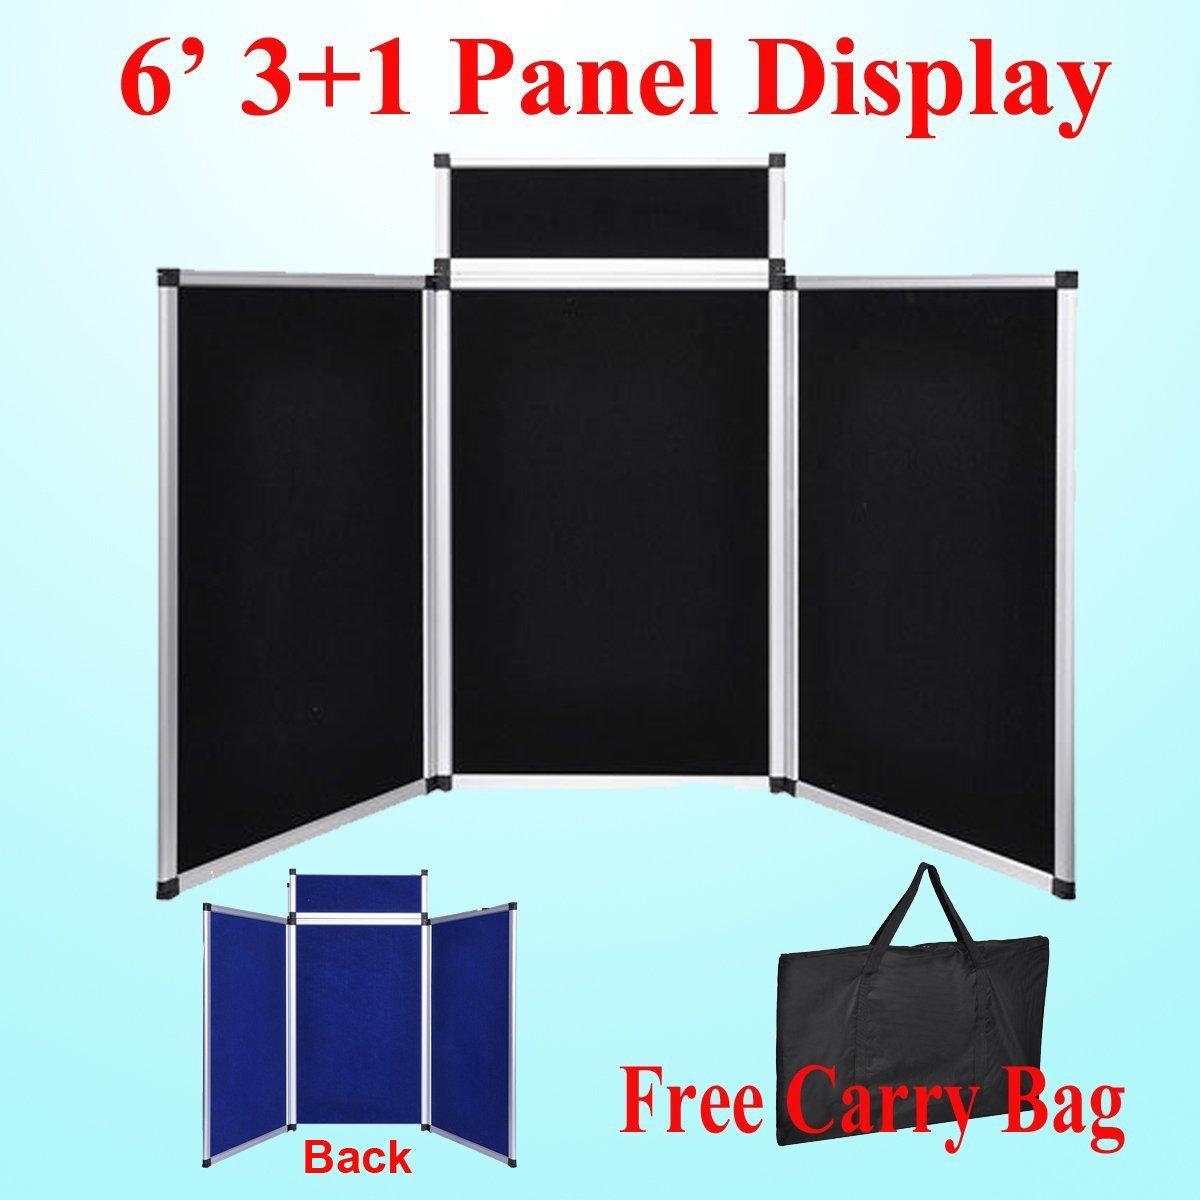 DSM Tm 6' 3+1 Hoop and Loop Black / Blue 2 Side Panel Header Trade Show Display Presentation Tabletop 6ft 3 Panel Folding